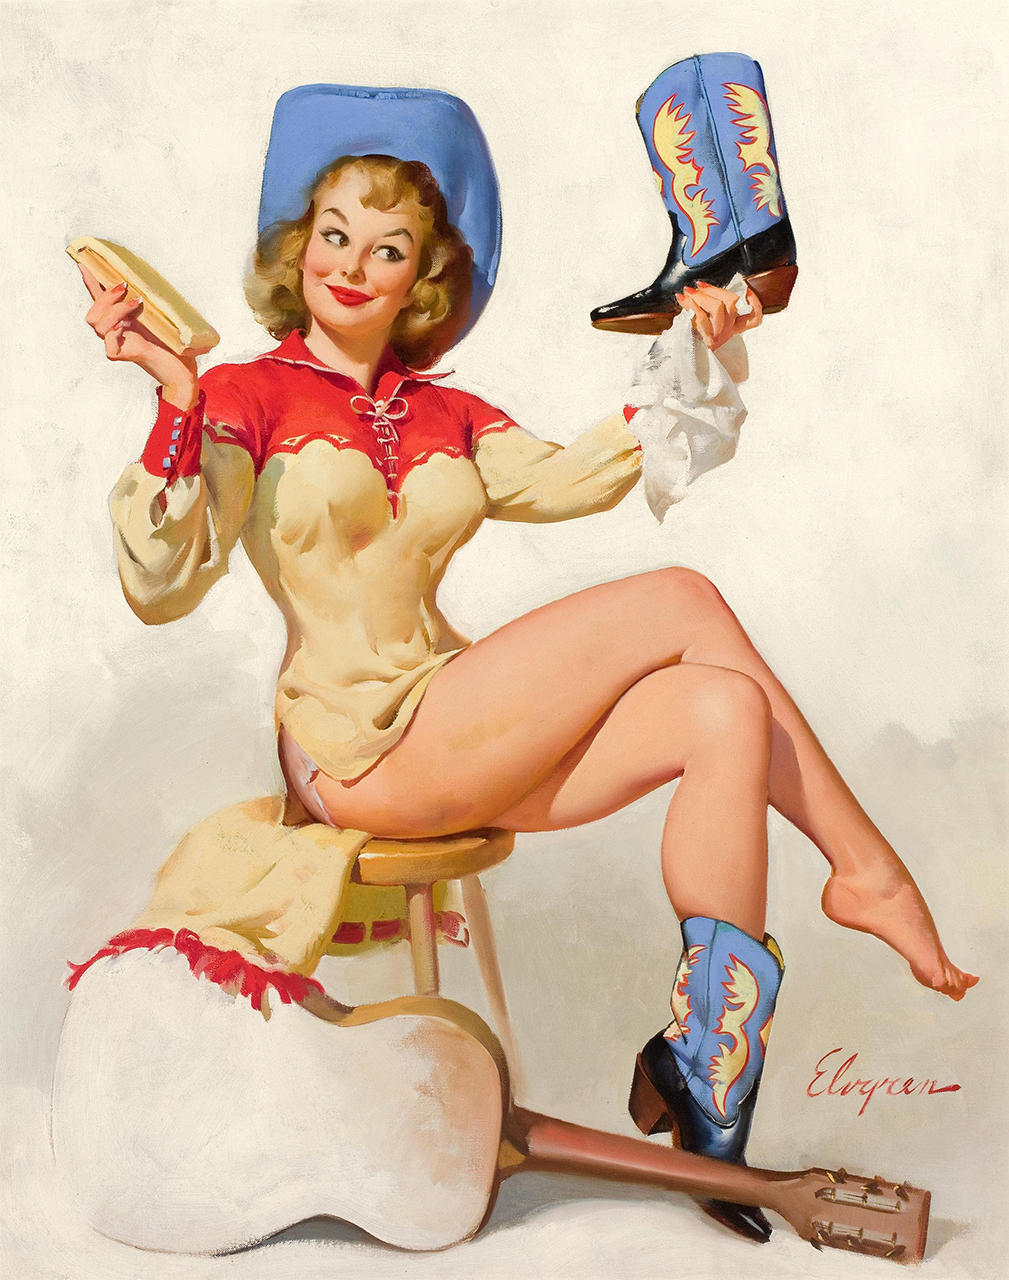 Постер (плакат) Джил Элвгрен: A polished performance